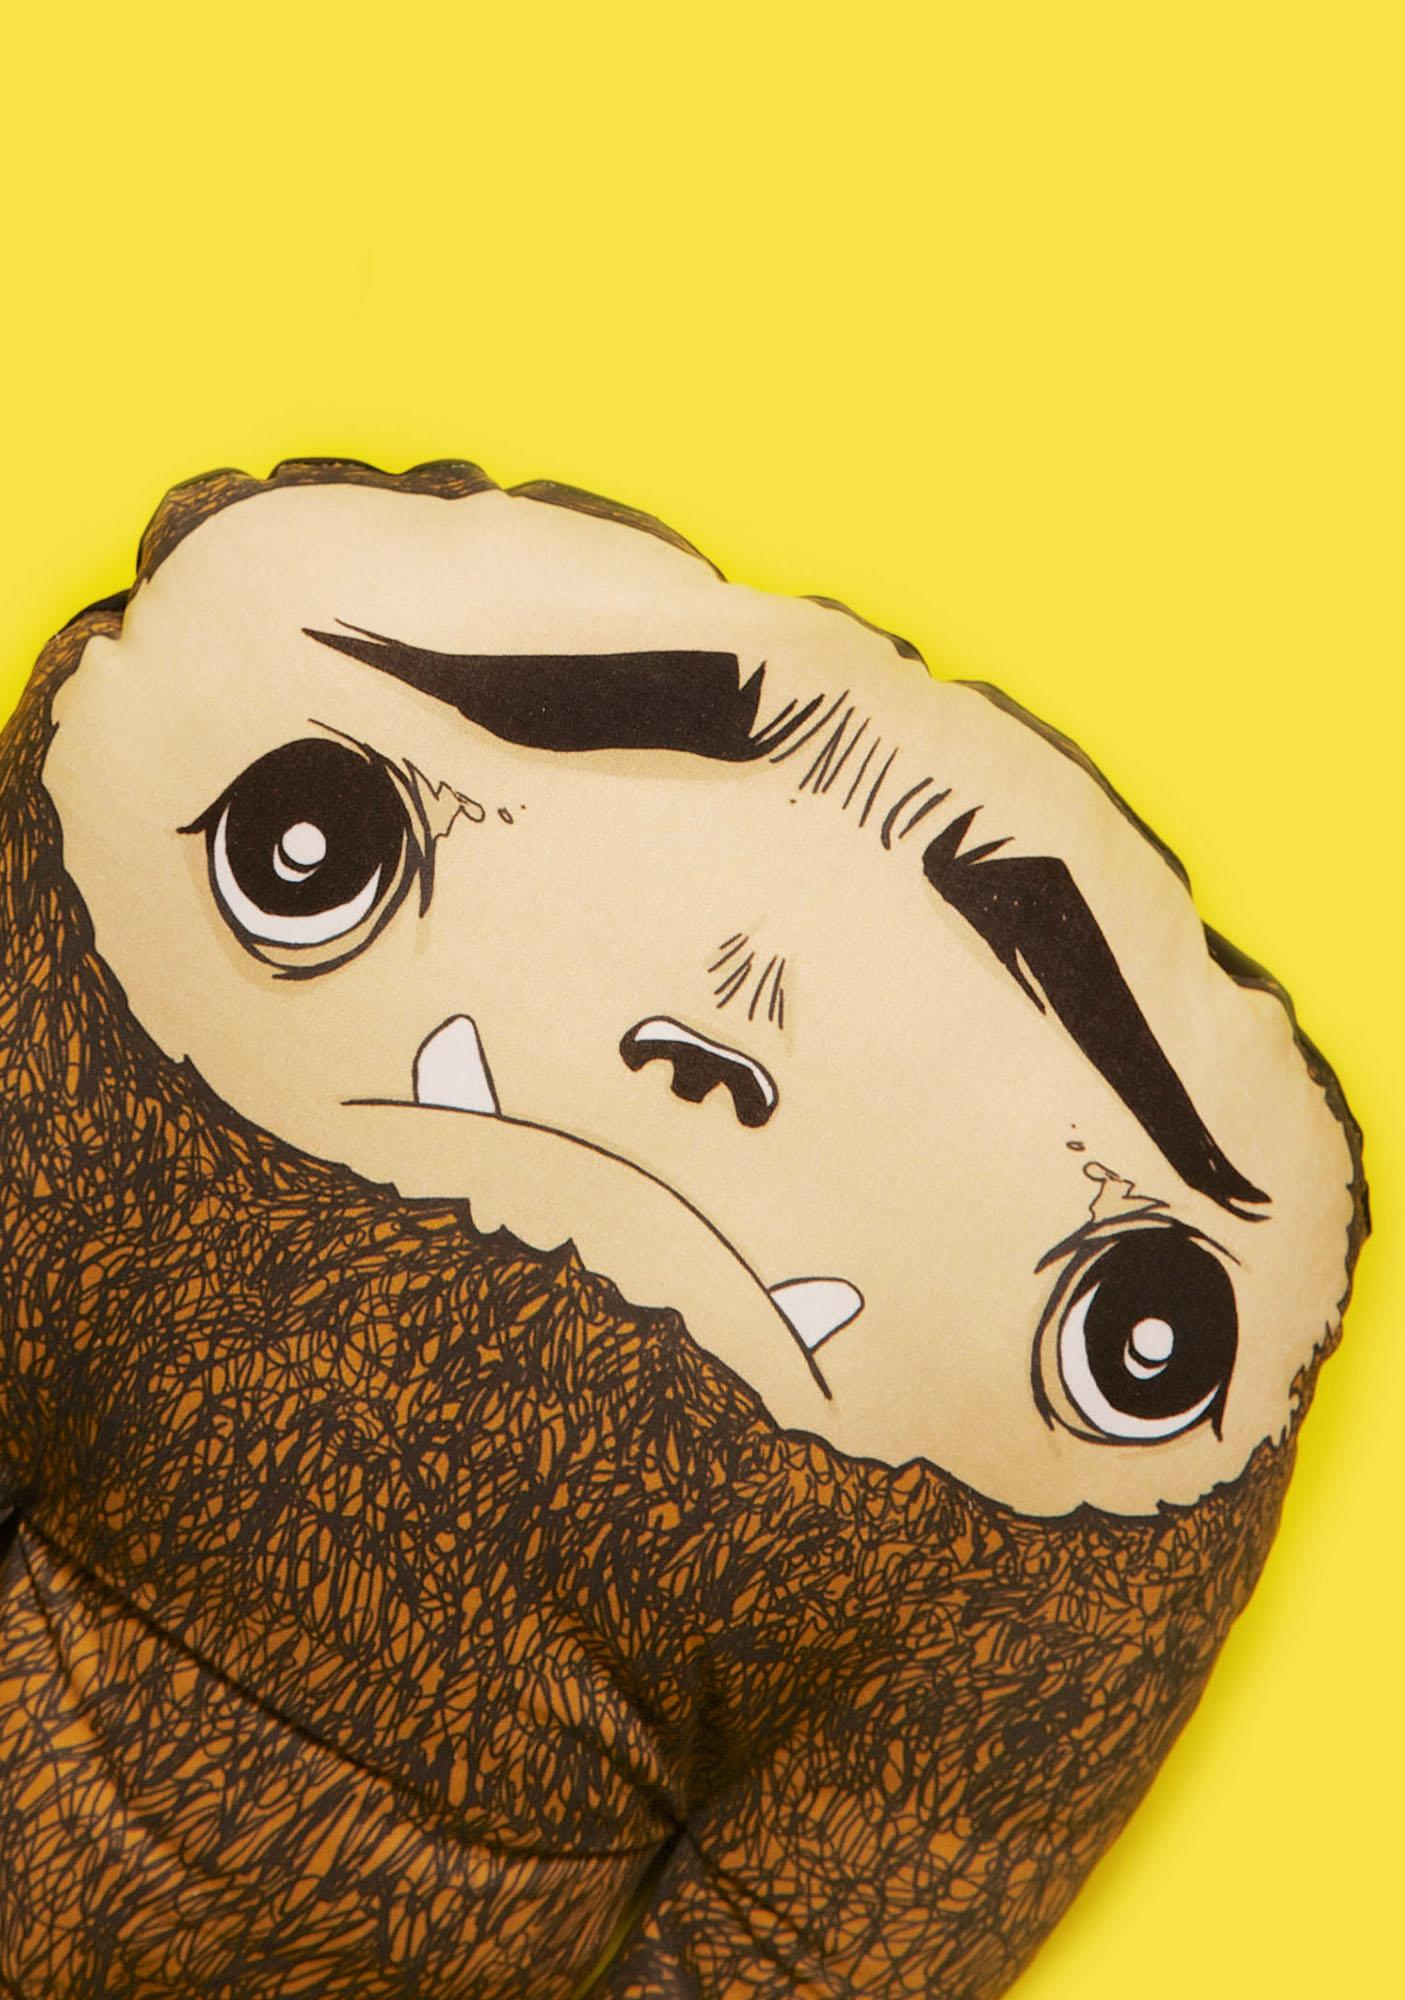 Pickled Punks Sadsquatch Plush